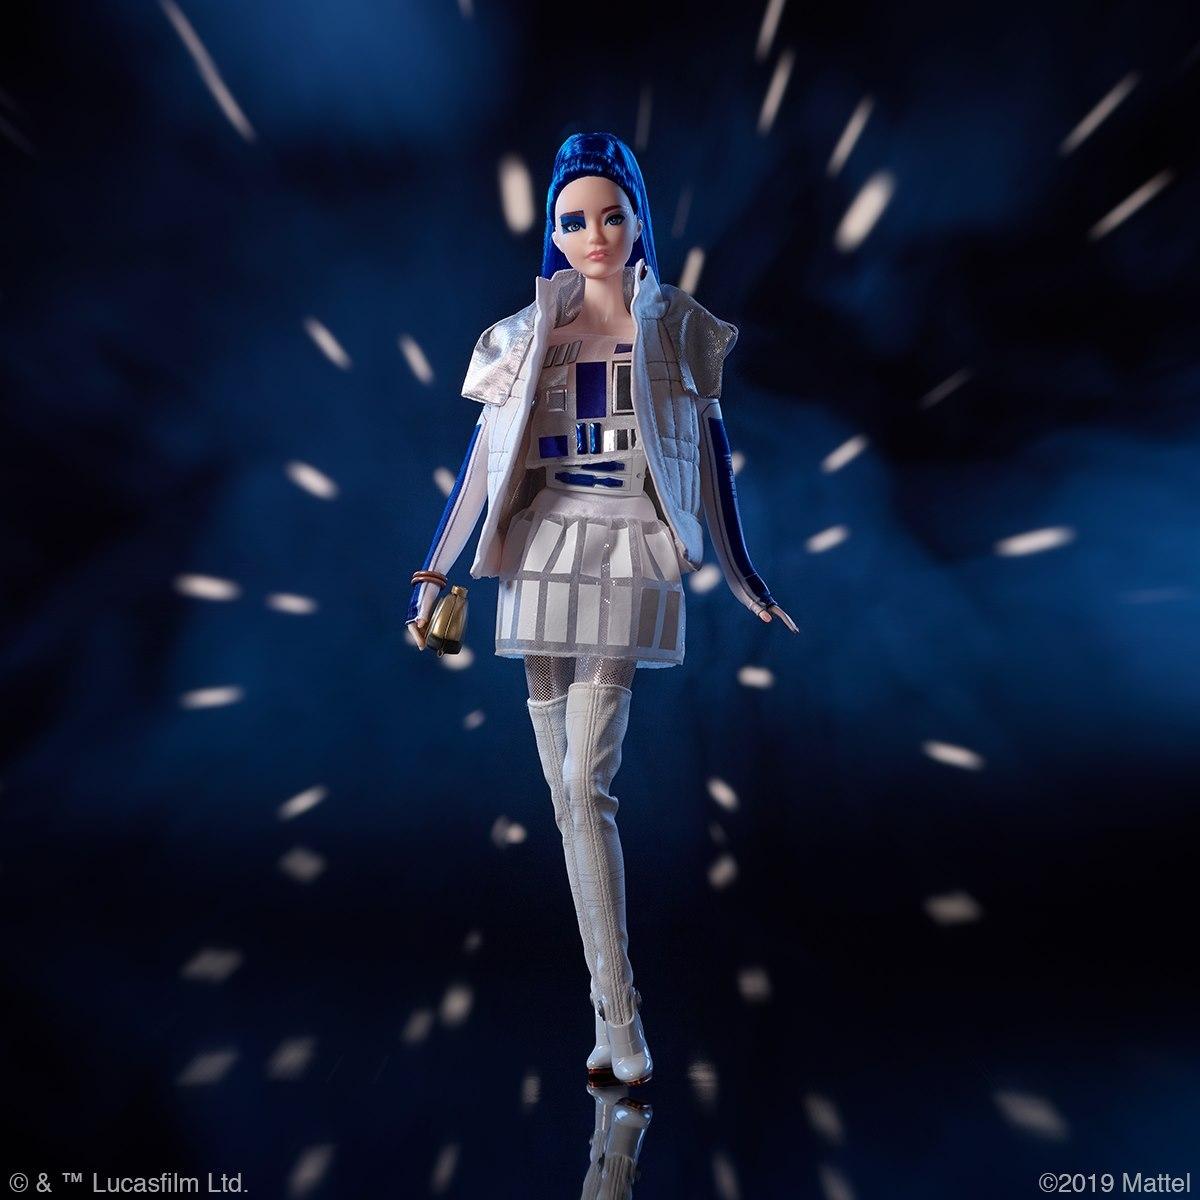 barbie-star wars